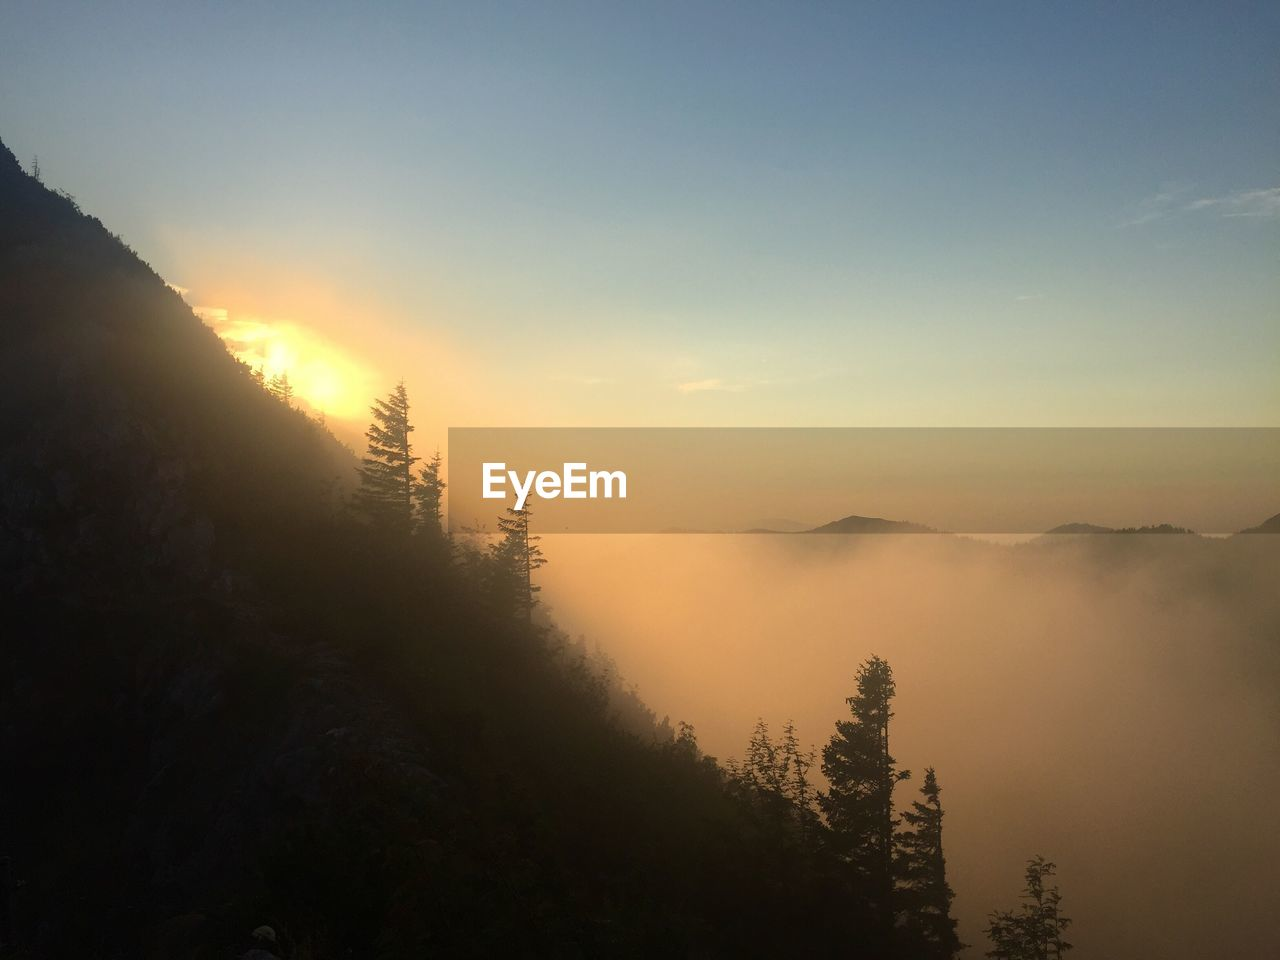 sky, tranquility, tranquil scene, scenics - nature, beauty in nature, mountain, sunset, tree, fog, nature, non-urban scene, no people, idyllic, plant, sun, mountain range, environment, silhouette, landscape, outdoors, hazy